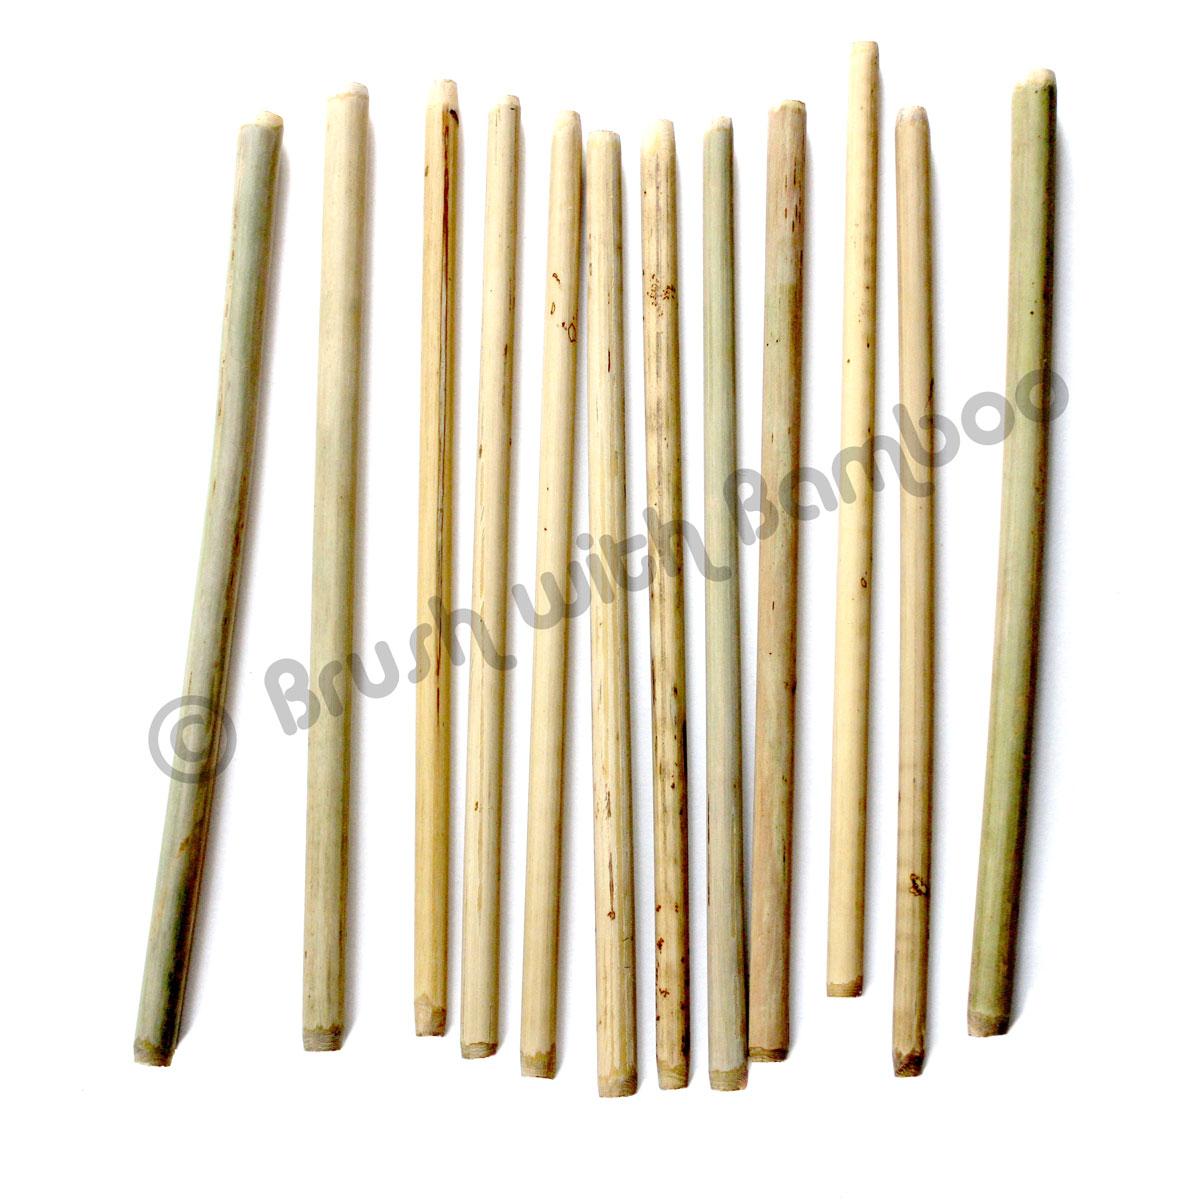 Bamboo Drinking Straws 12-Pack